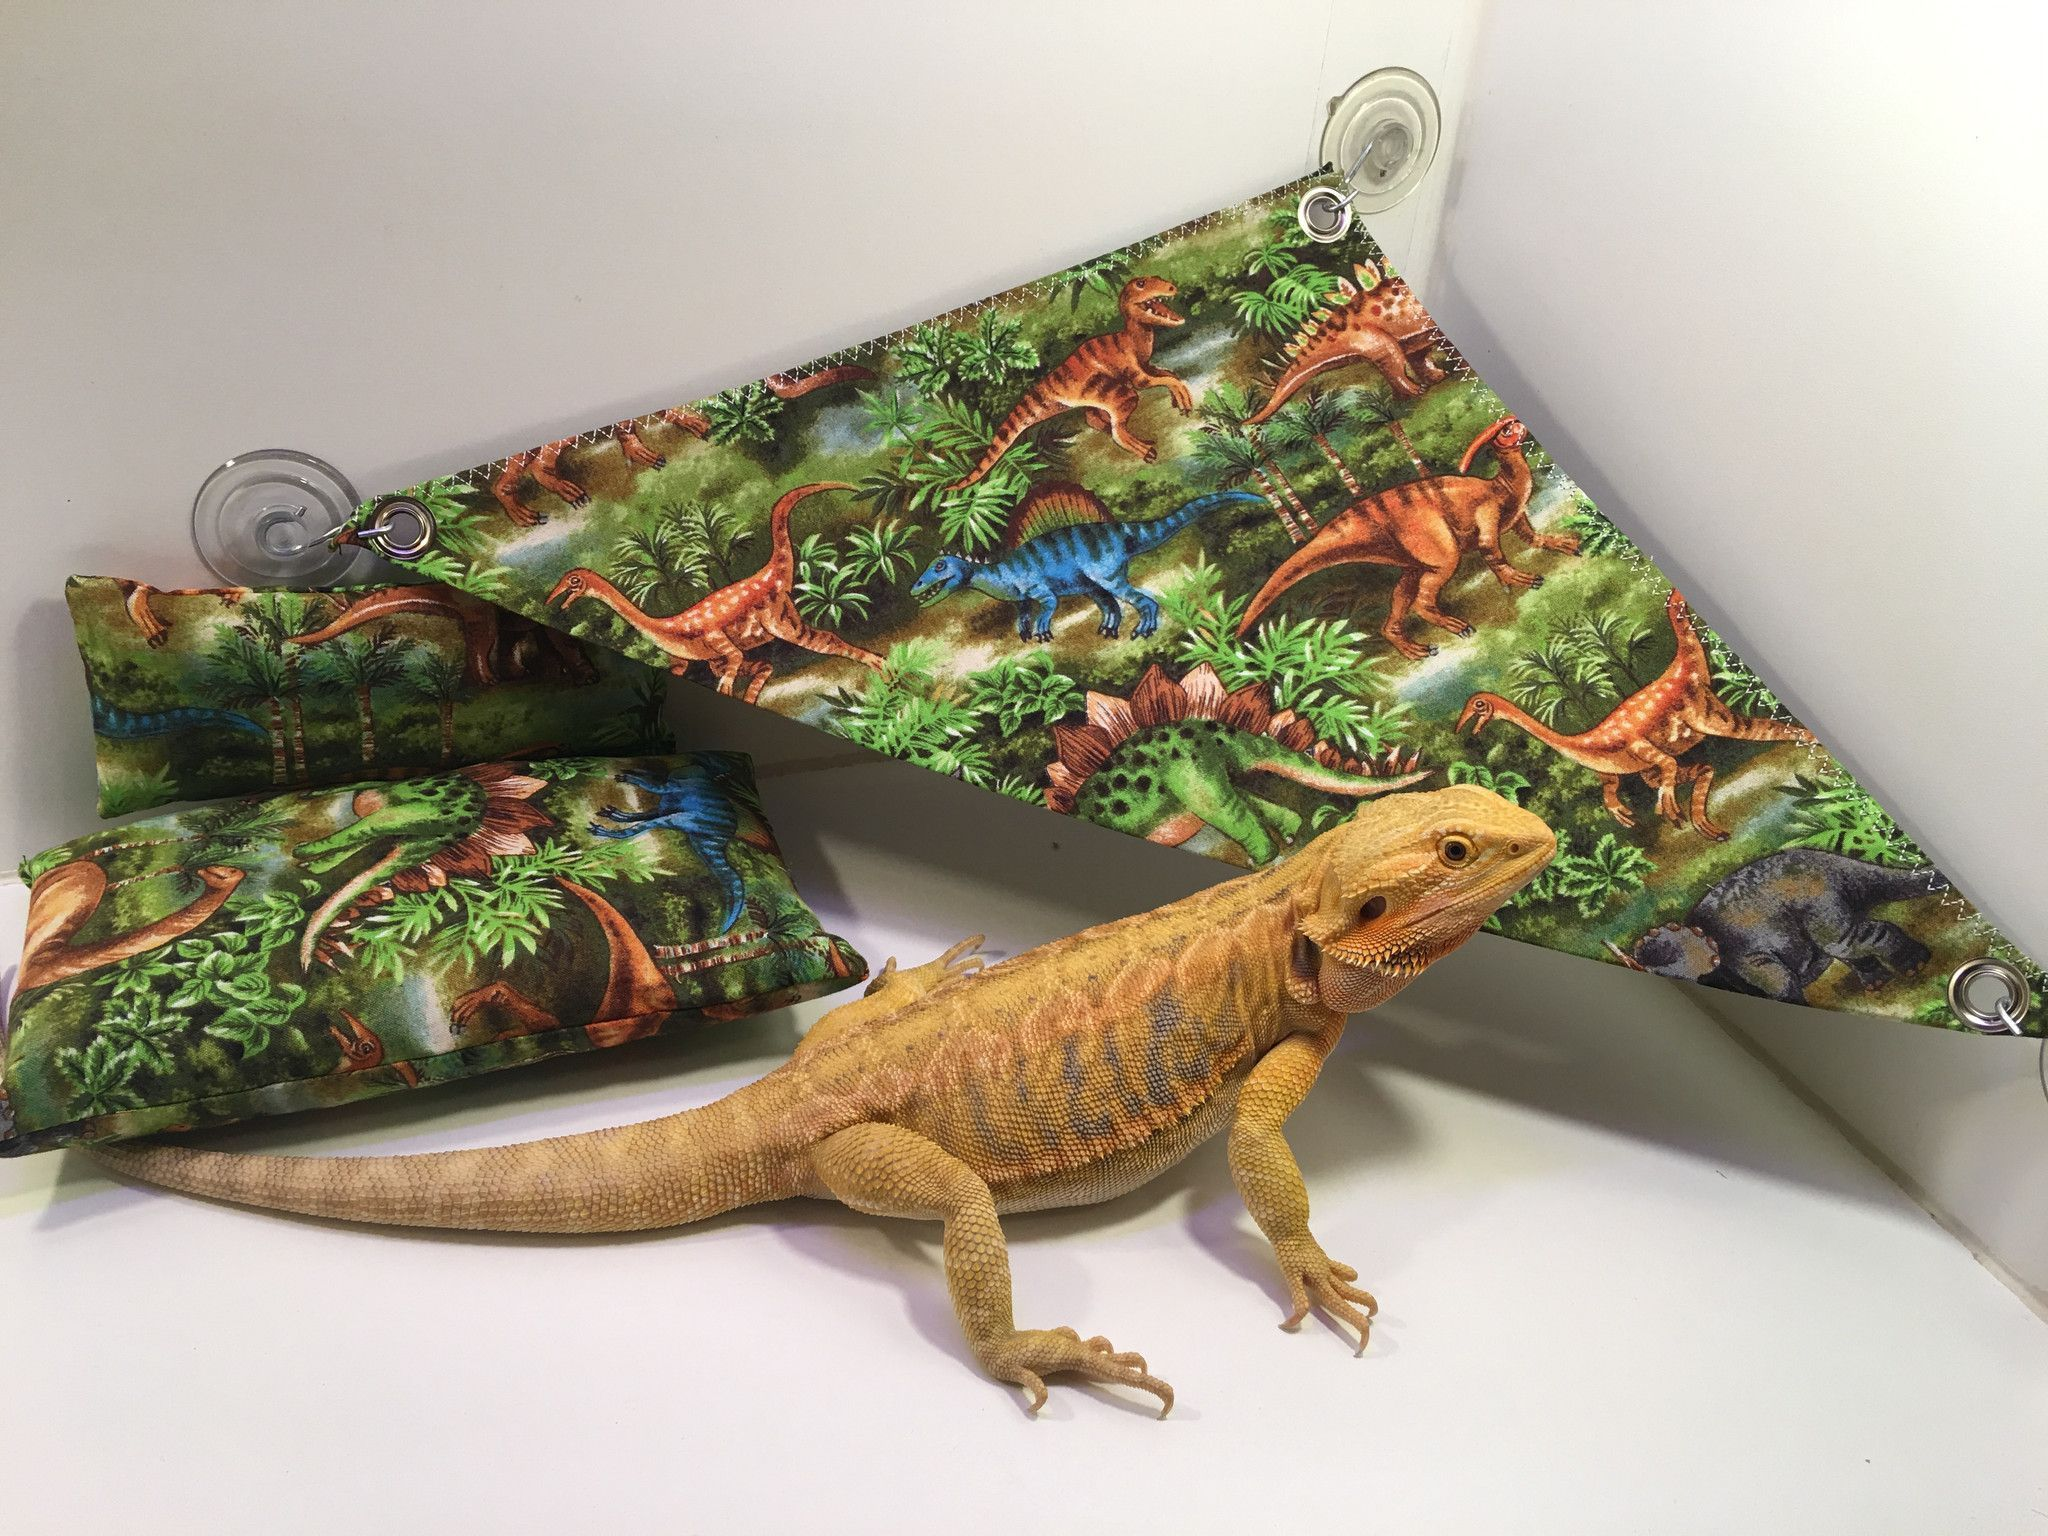 bearded dragon g dinosaur bed pillow hammock set small animal lizard reptile all sets are made for 40 gallon tanks or larger  hammocks are      rh   pinterest